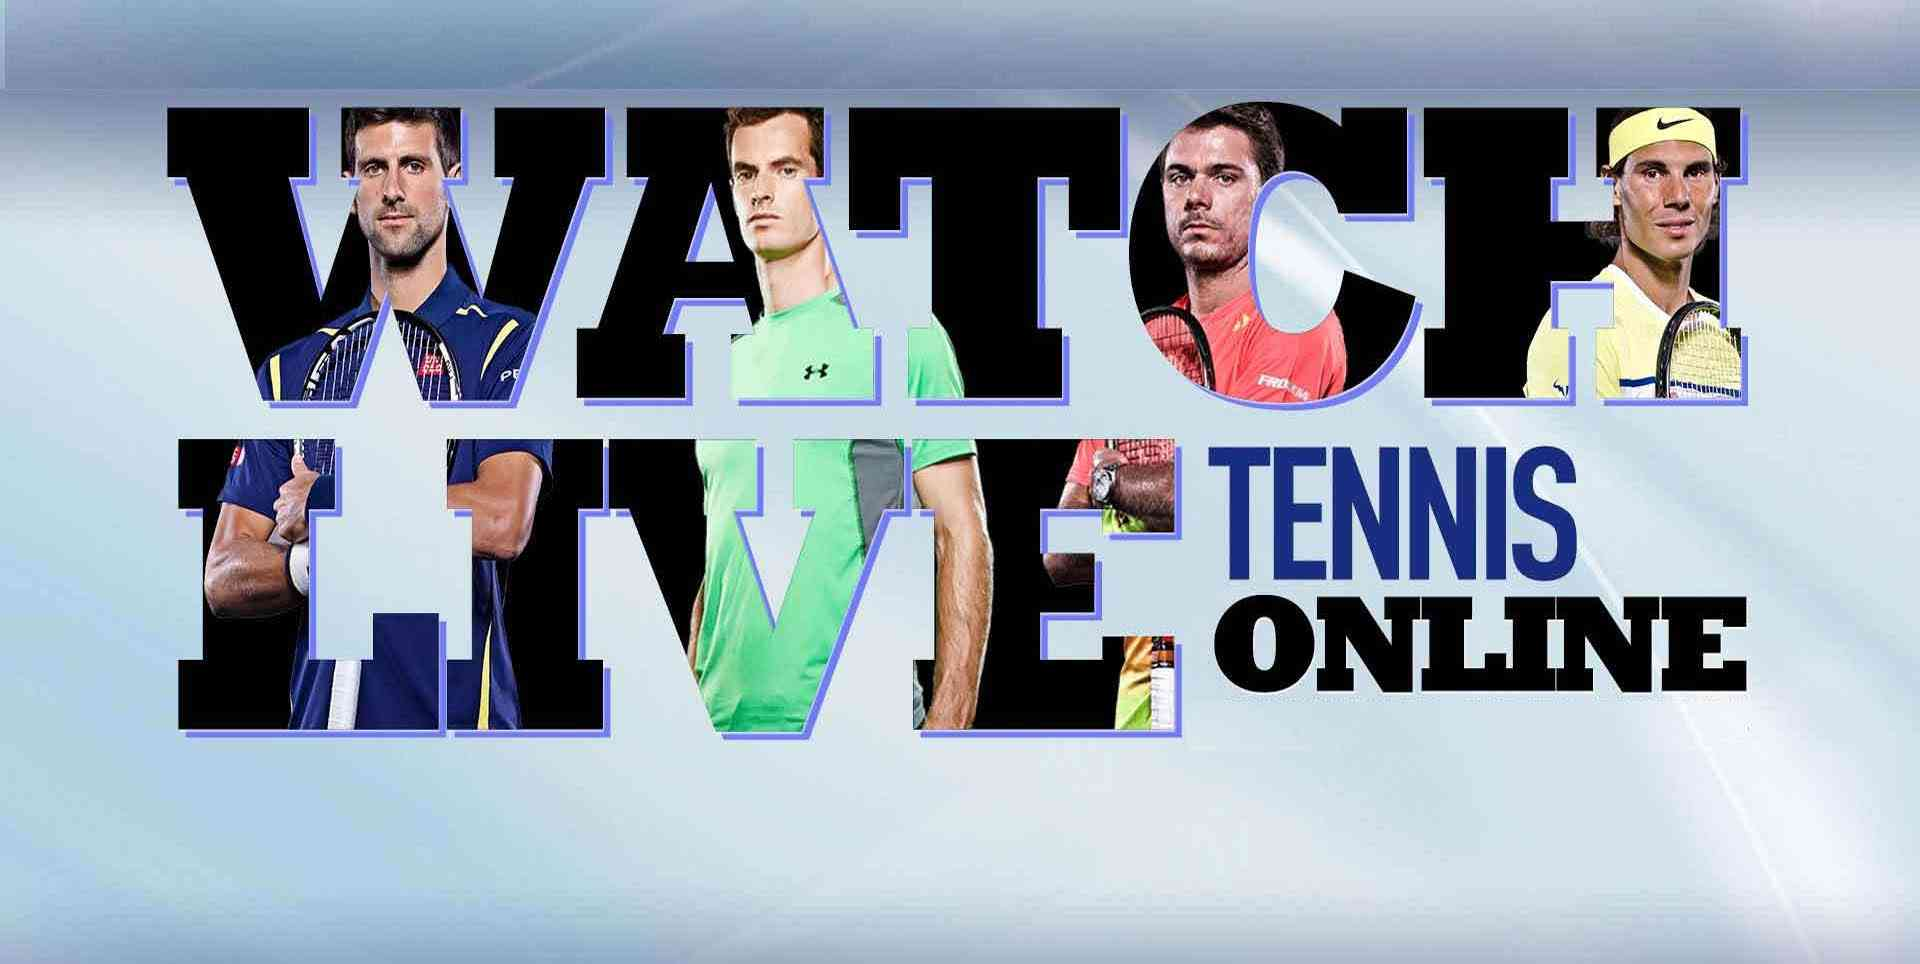 ATP SkiStar Swedish Open